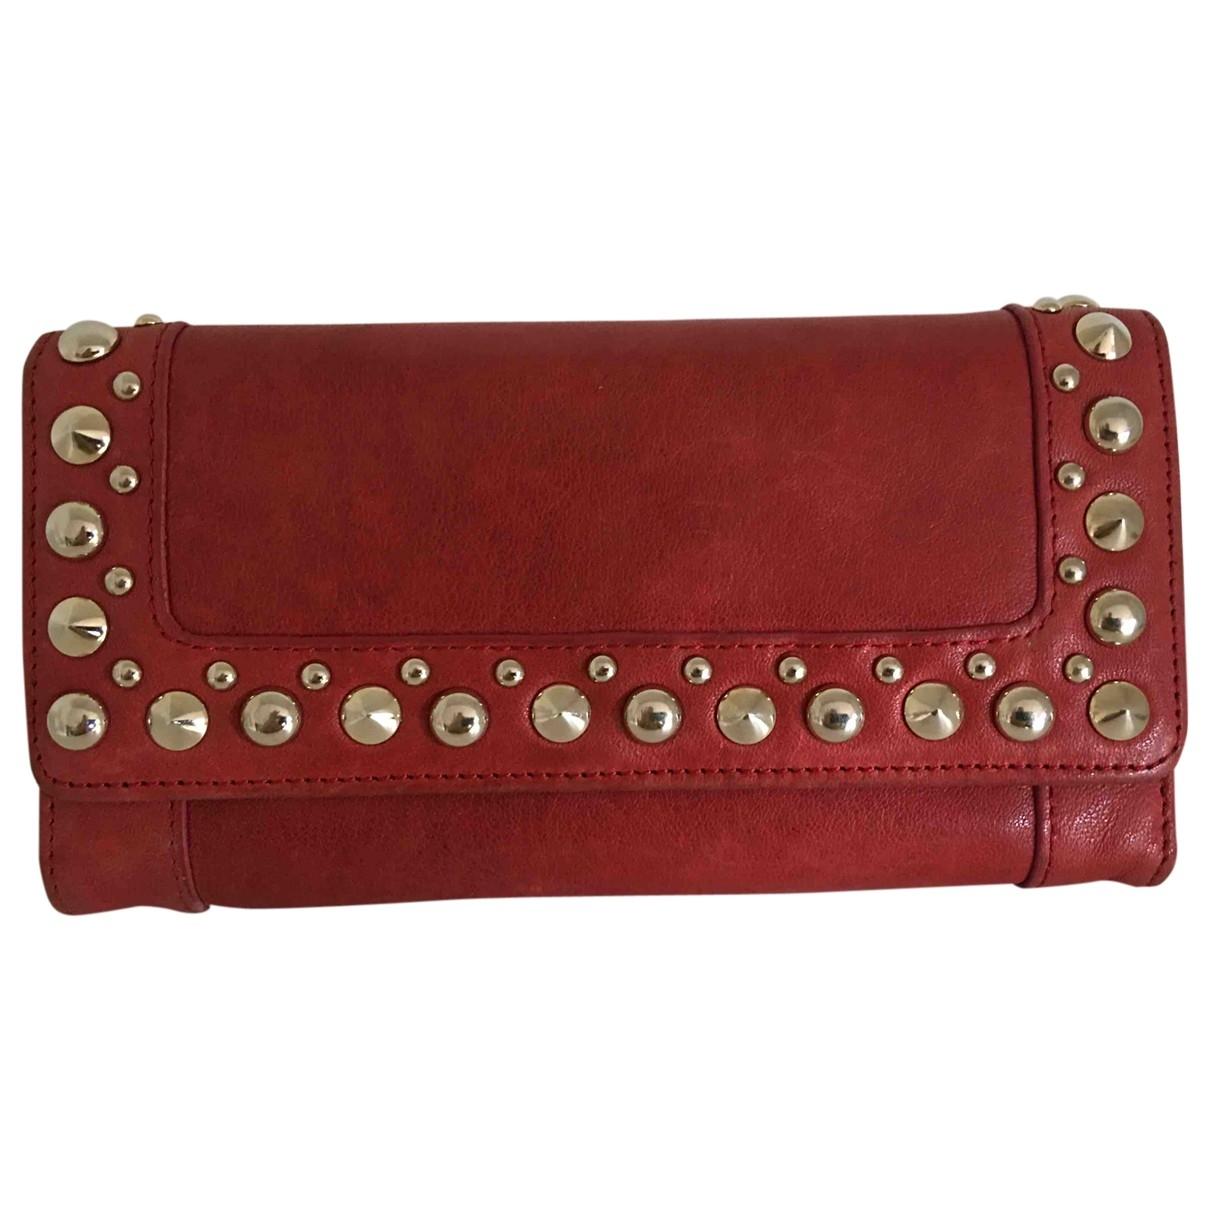 Patrizia Pepe \N Portemonnaie in  Rot Leder